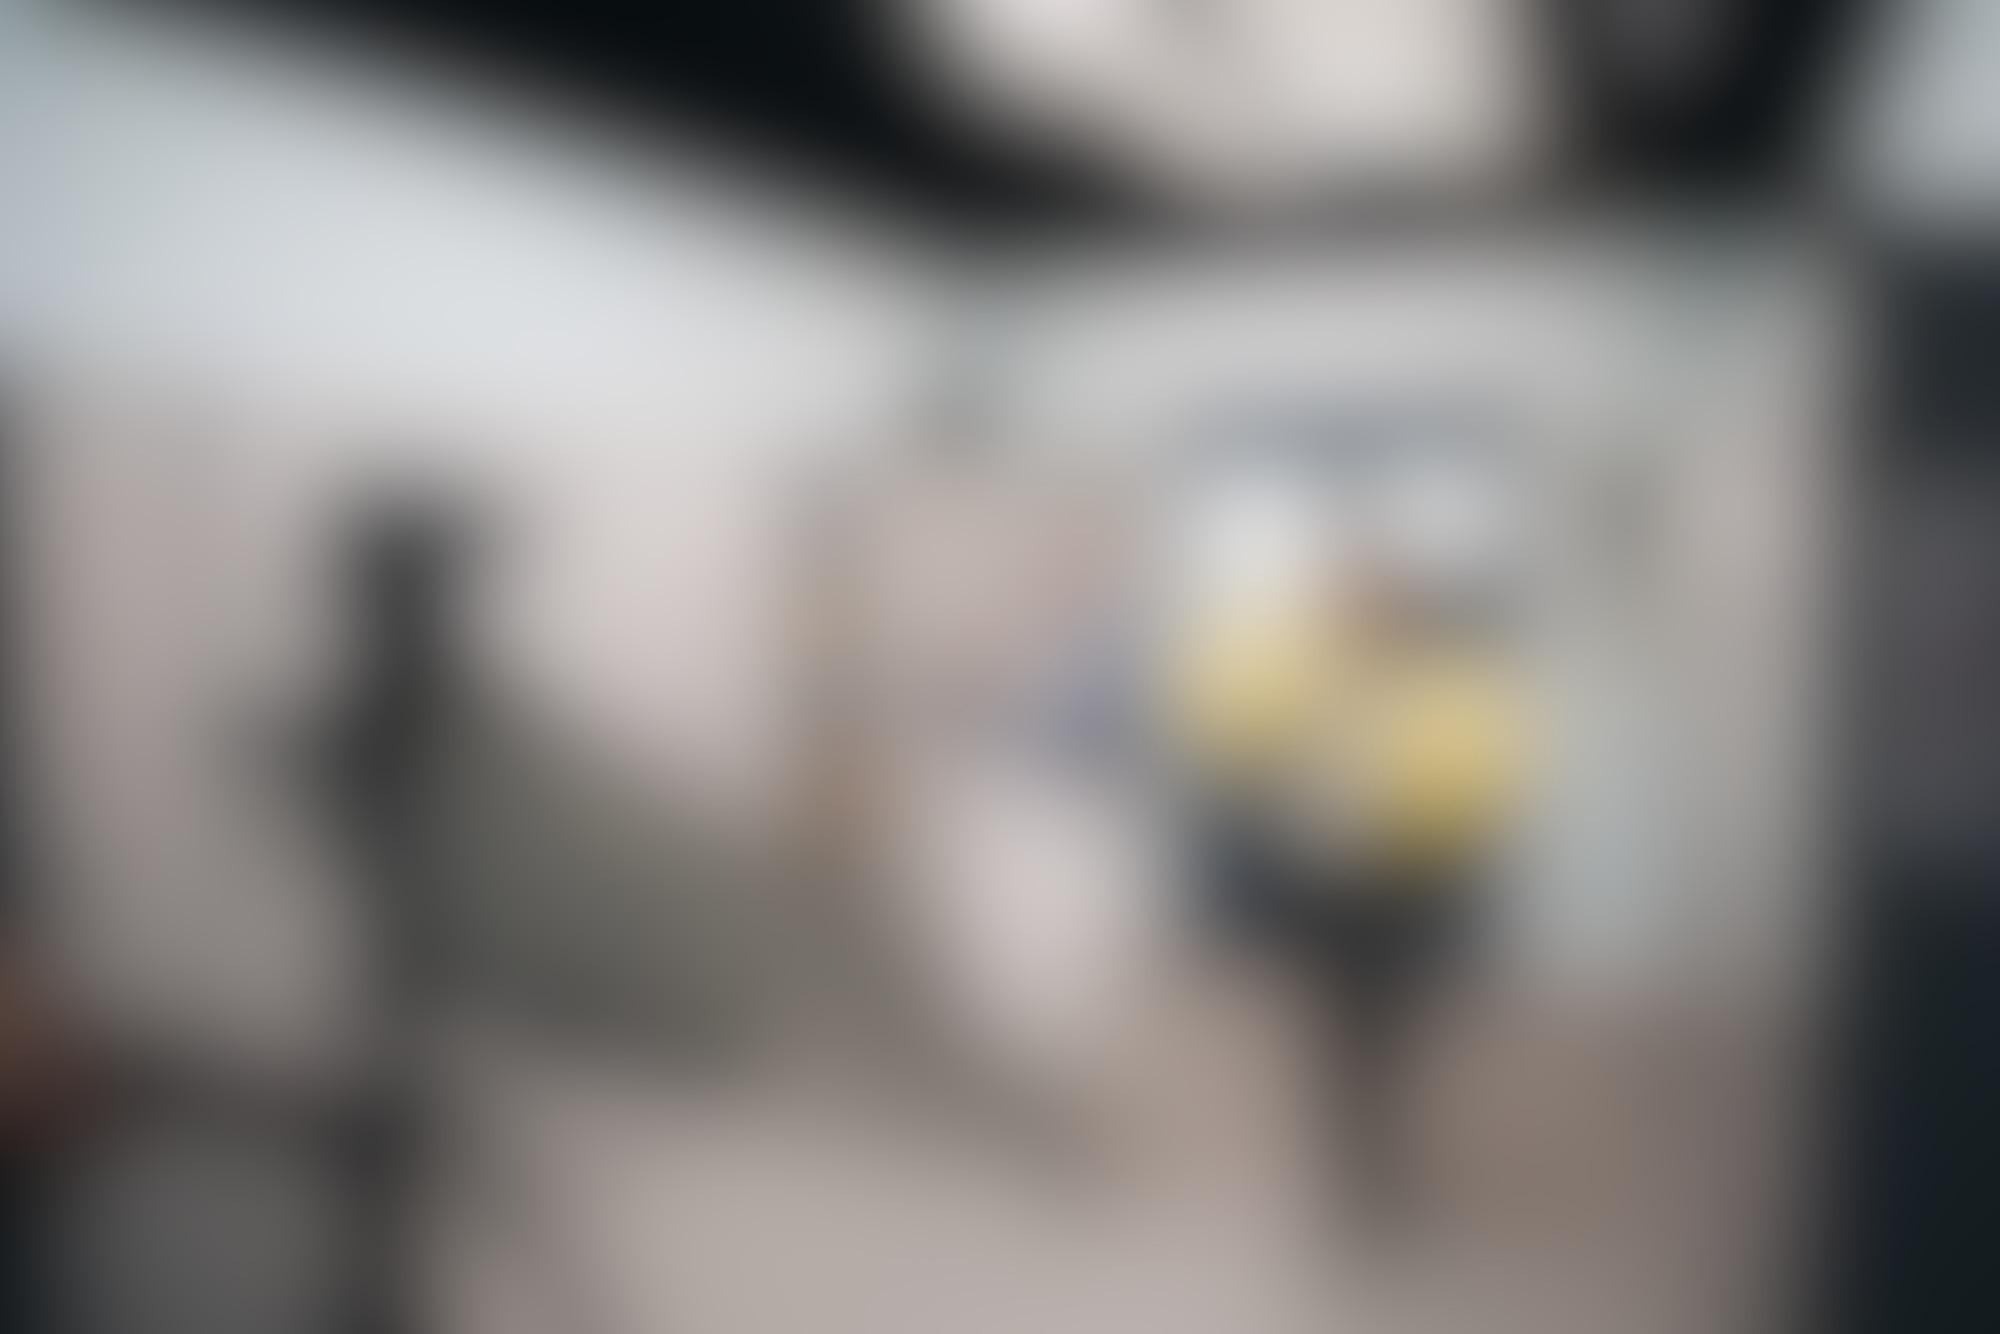 Lord Whitney Netflix Experience Arndale Luke Fullalove 6091 autocompressfitresizeixlibphp 1 1 0max h2000max w3 D2000q80s177e58b8aea26b026775d04881d54b07